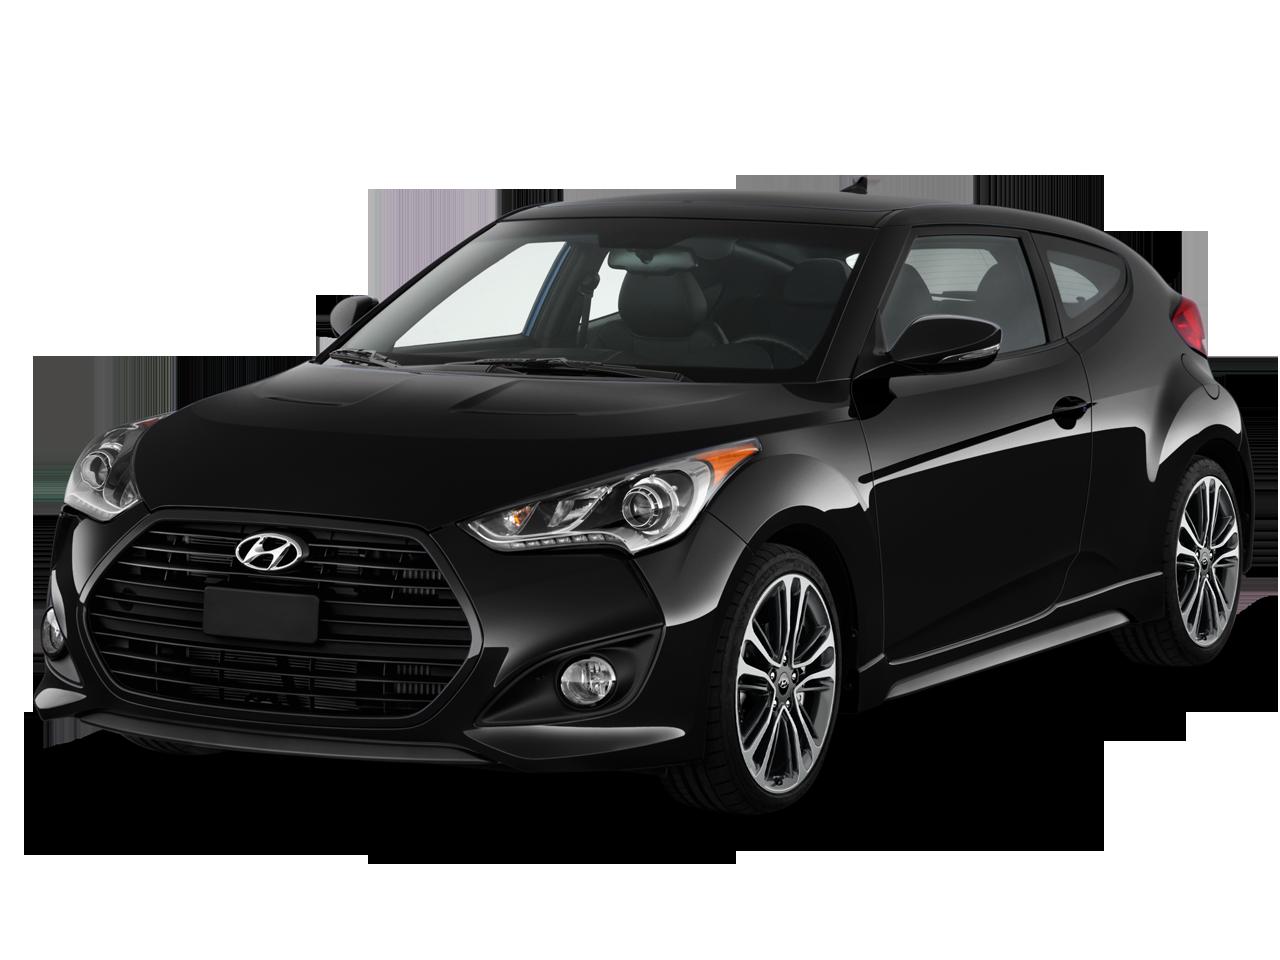 Hyundai kia motor finance company retail - New 2017 Hyundai Veloster Turbo Turbo Dual Clutch